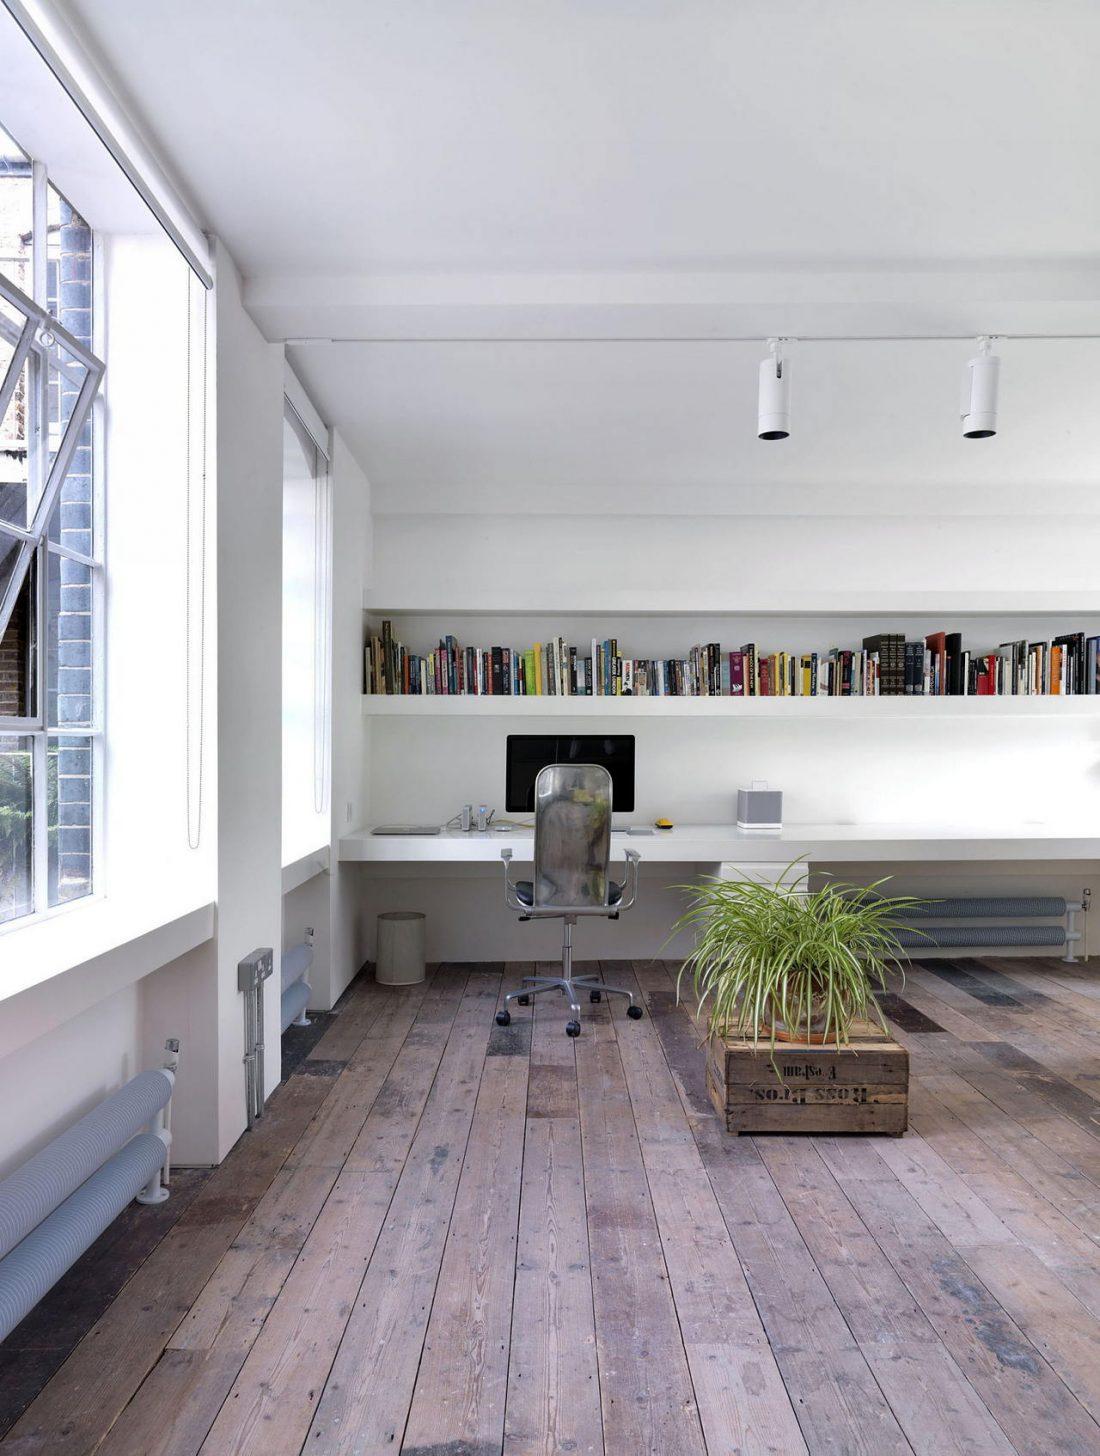 Дизайн интерьера квартиры в стиле лофт 18